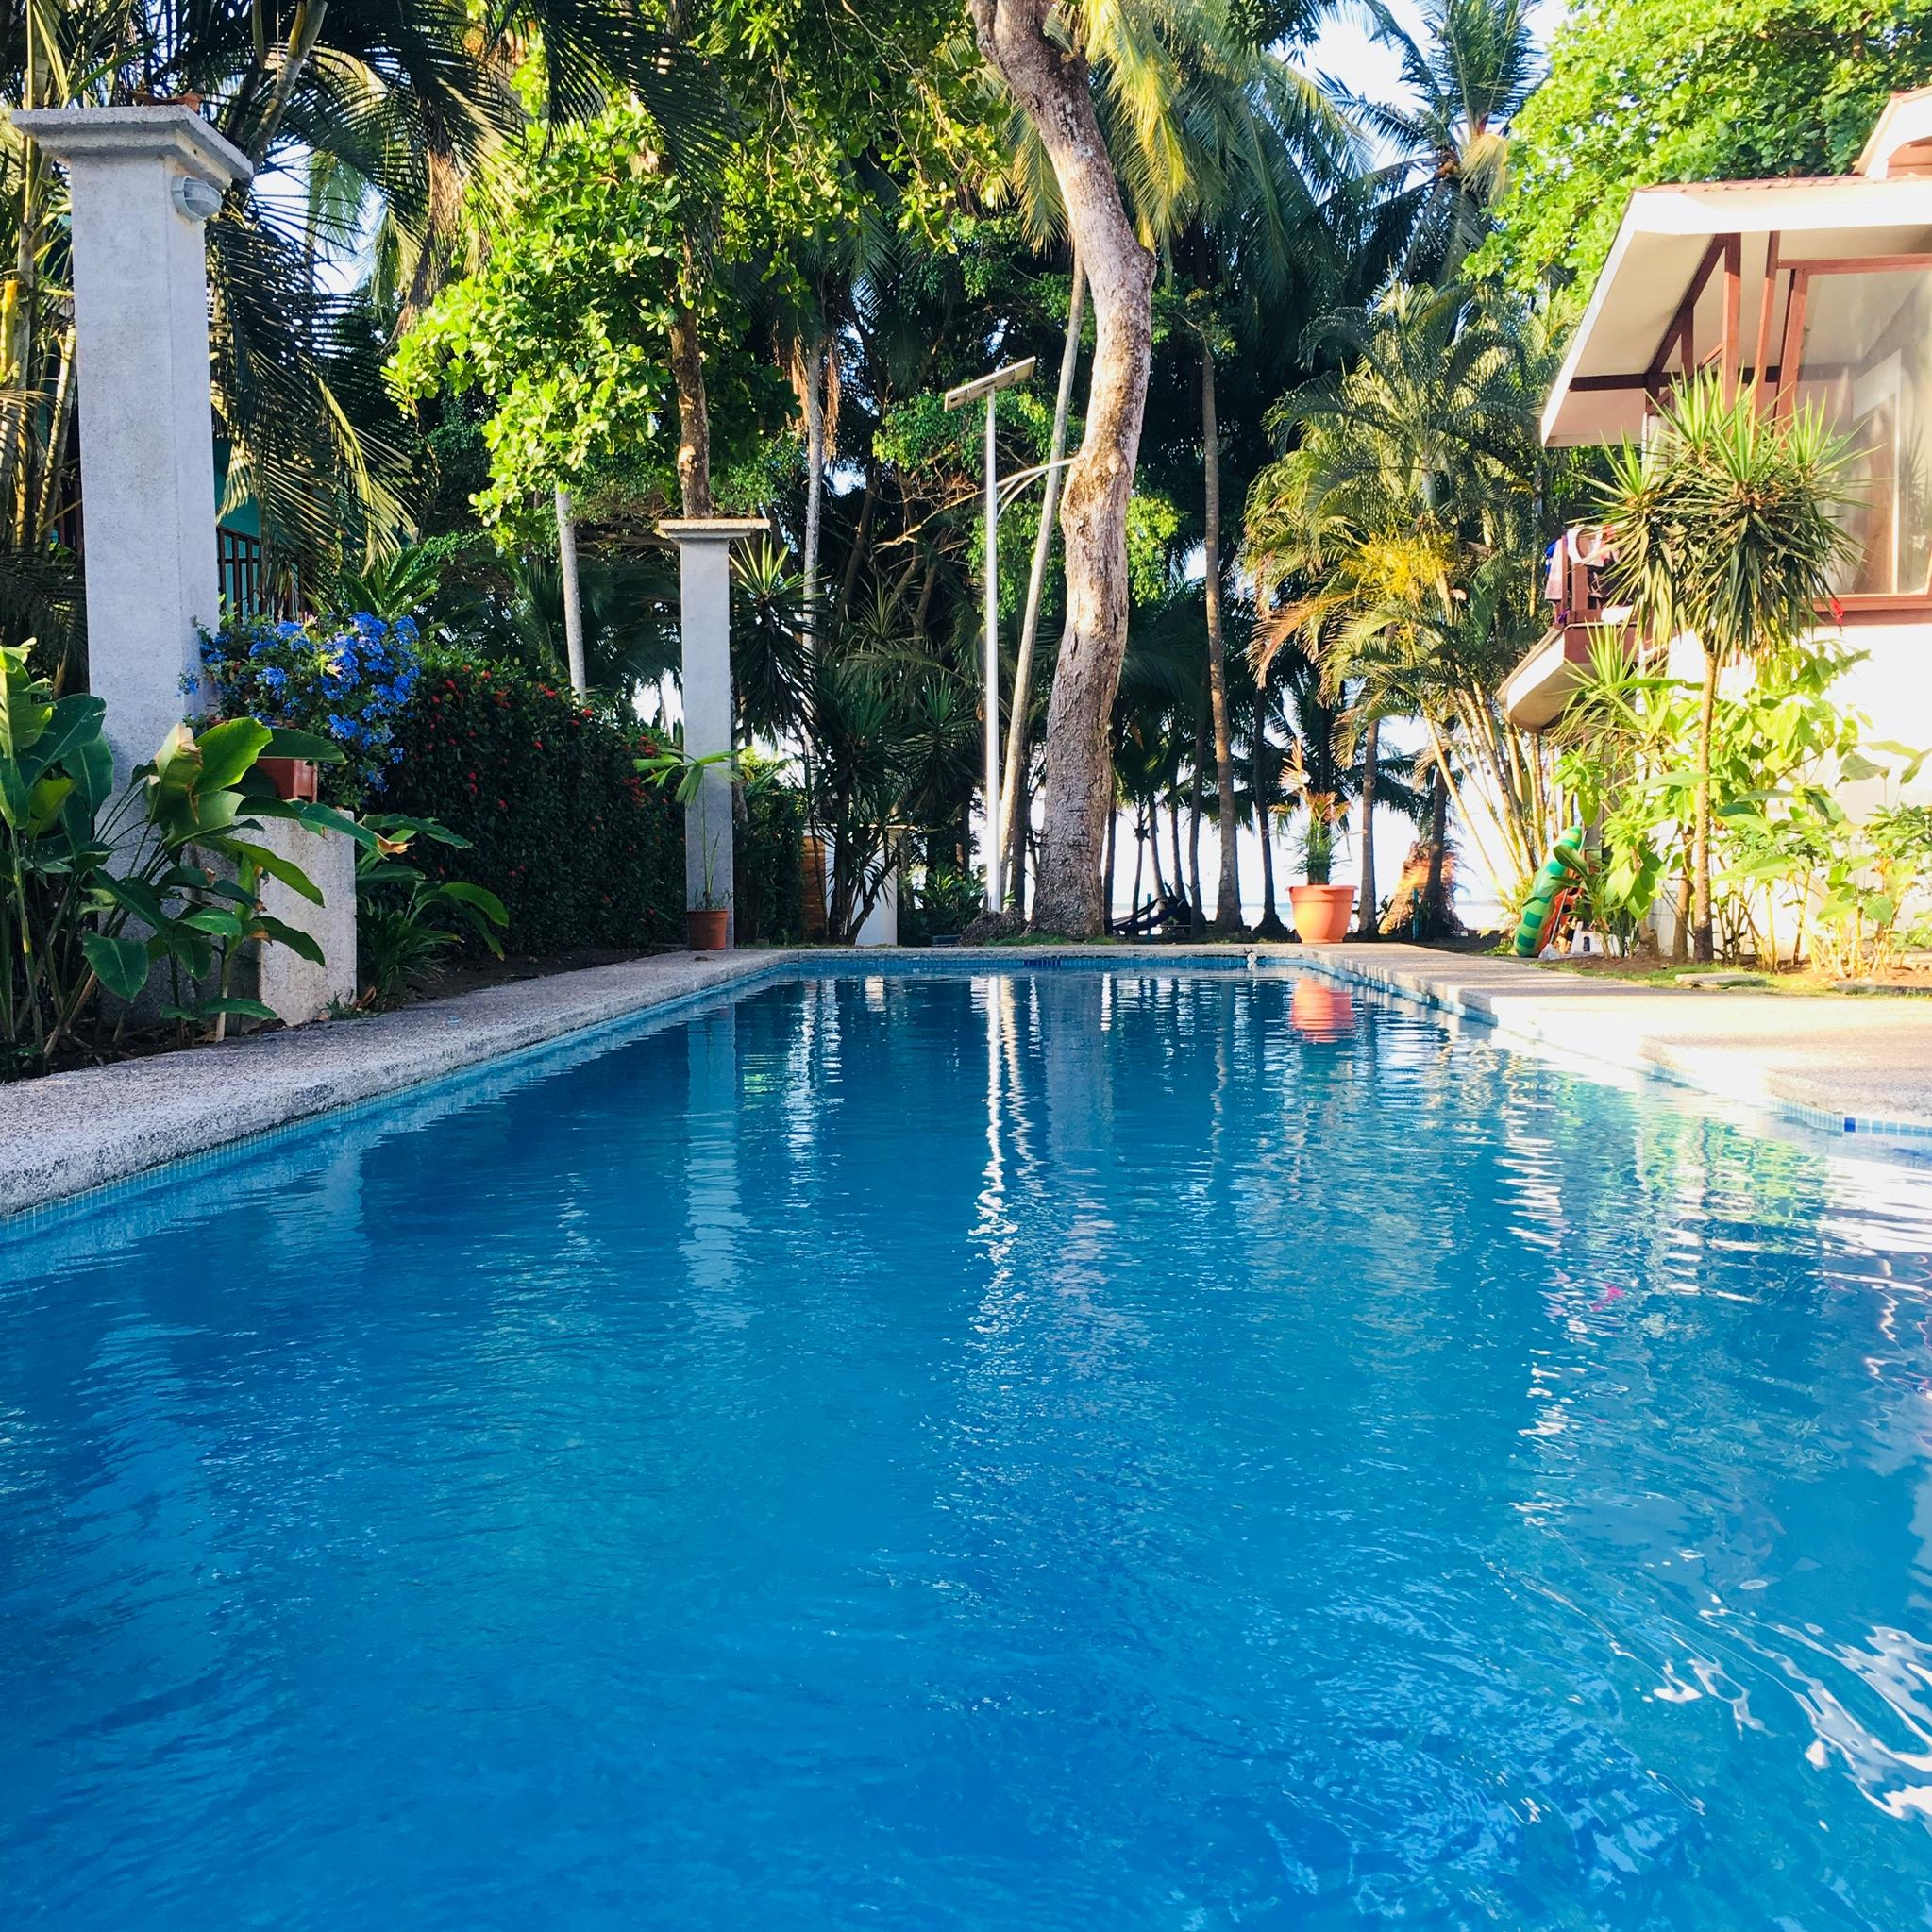 Private pool at the Hotel Pelicano